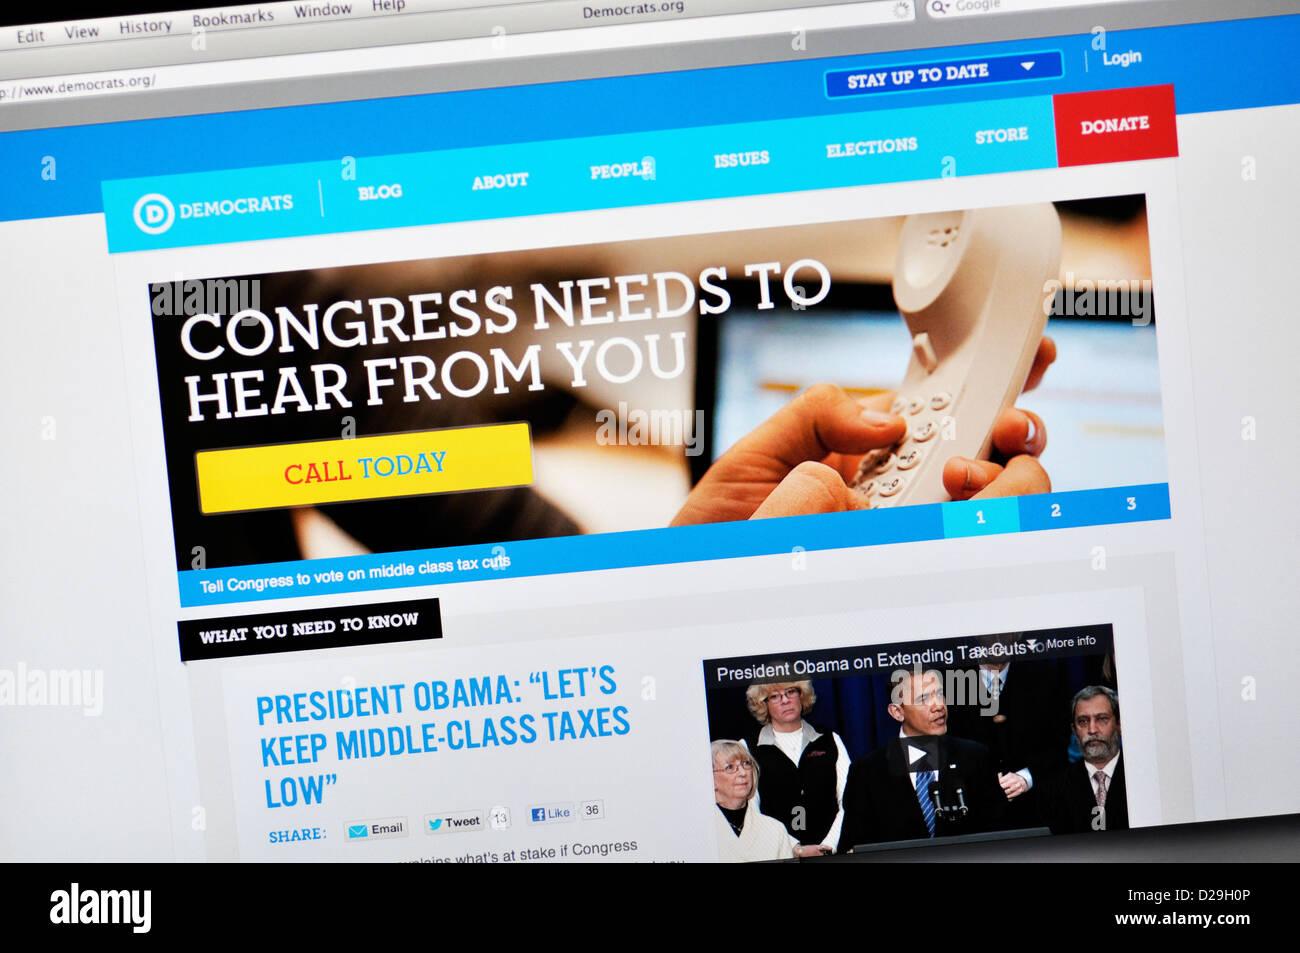 Democrats.org website - Democratic political party - Stock Image